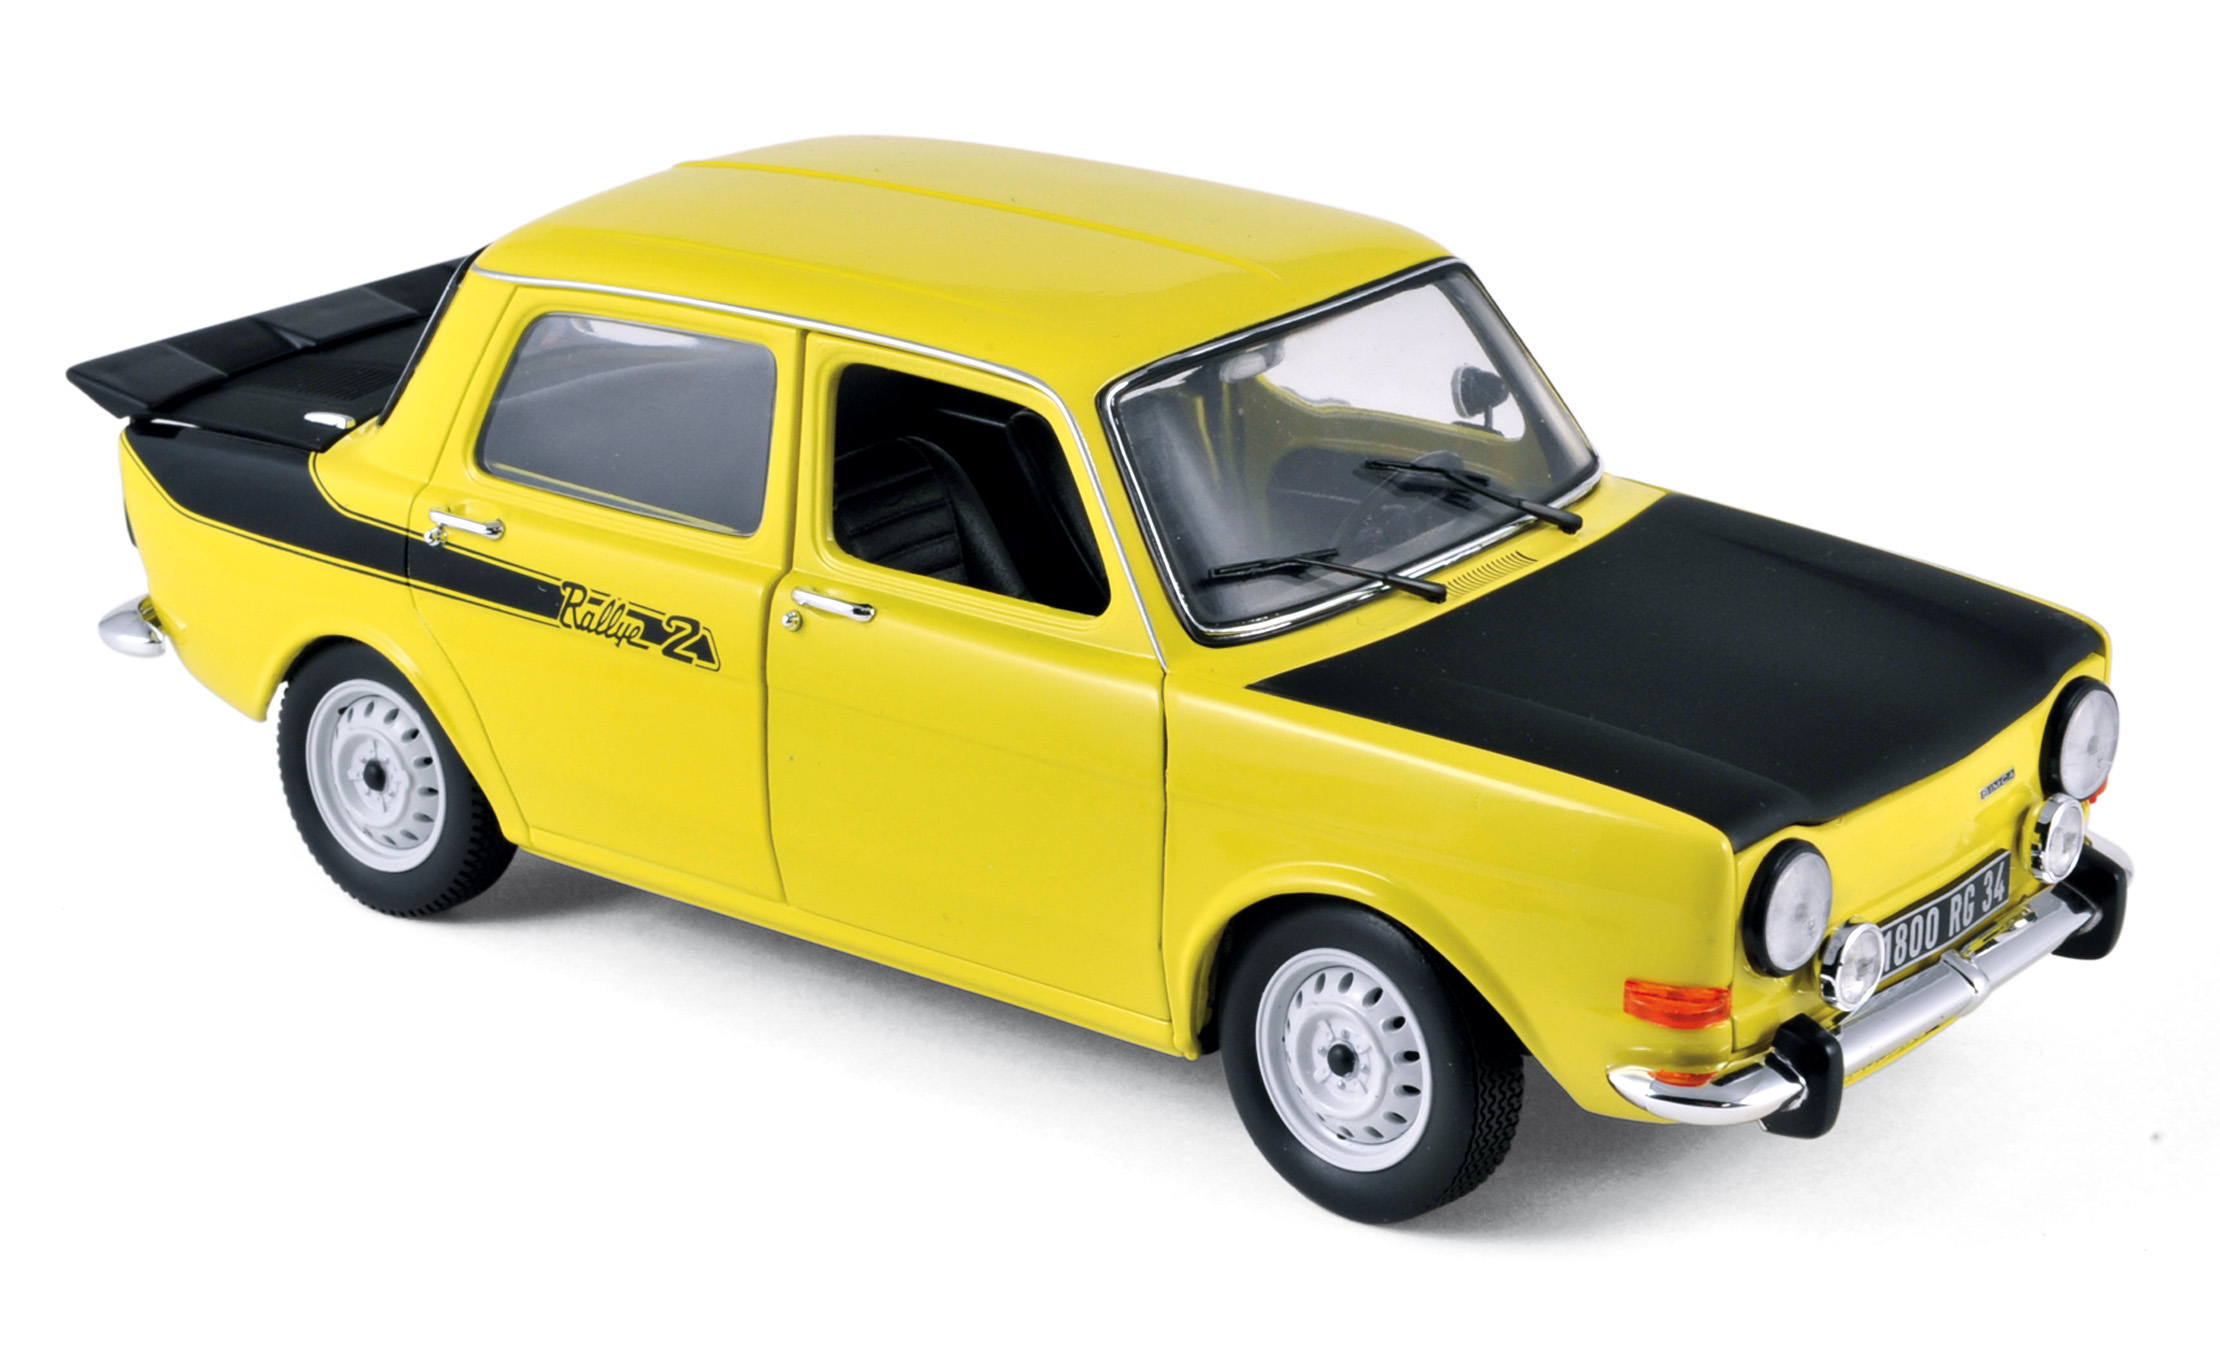 modellauto simca 1000 rallye 2 gelb 1976 norev 1 18 bei. Black Bedroom Furniture Sets. Home Design Ideas